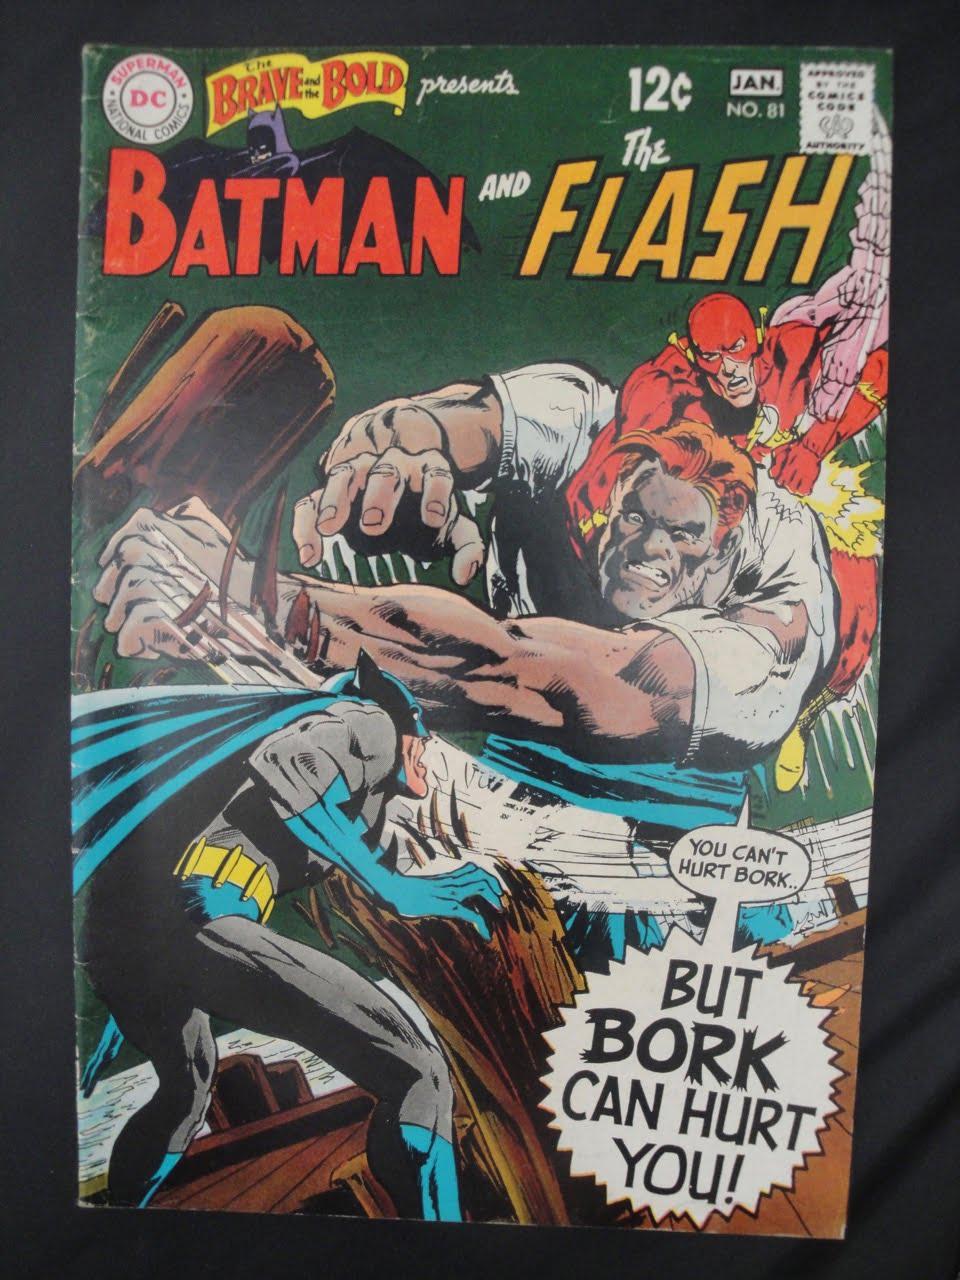 Brave and the Bold #81, Jan 1969, Batman, Flash, art by Neal Adams